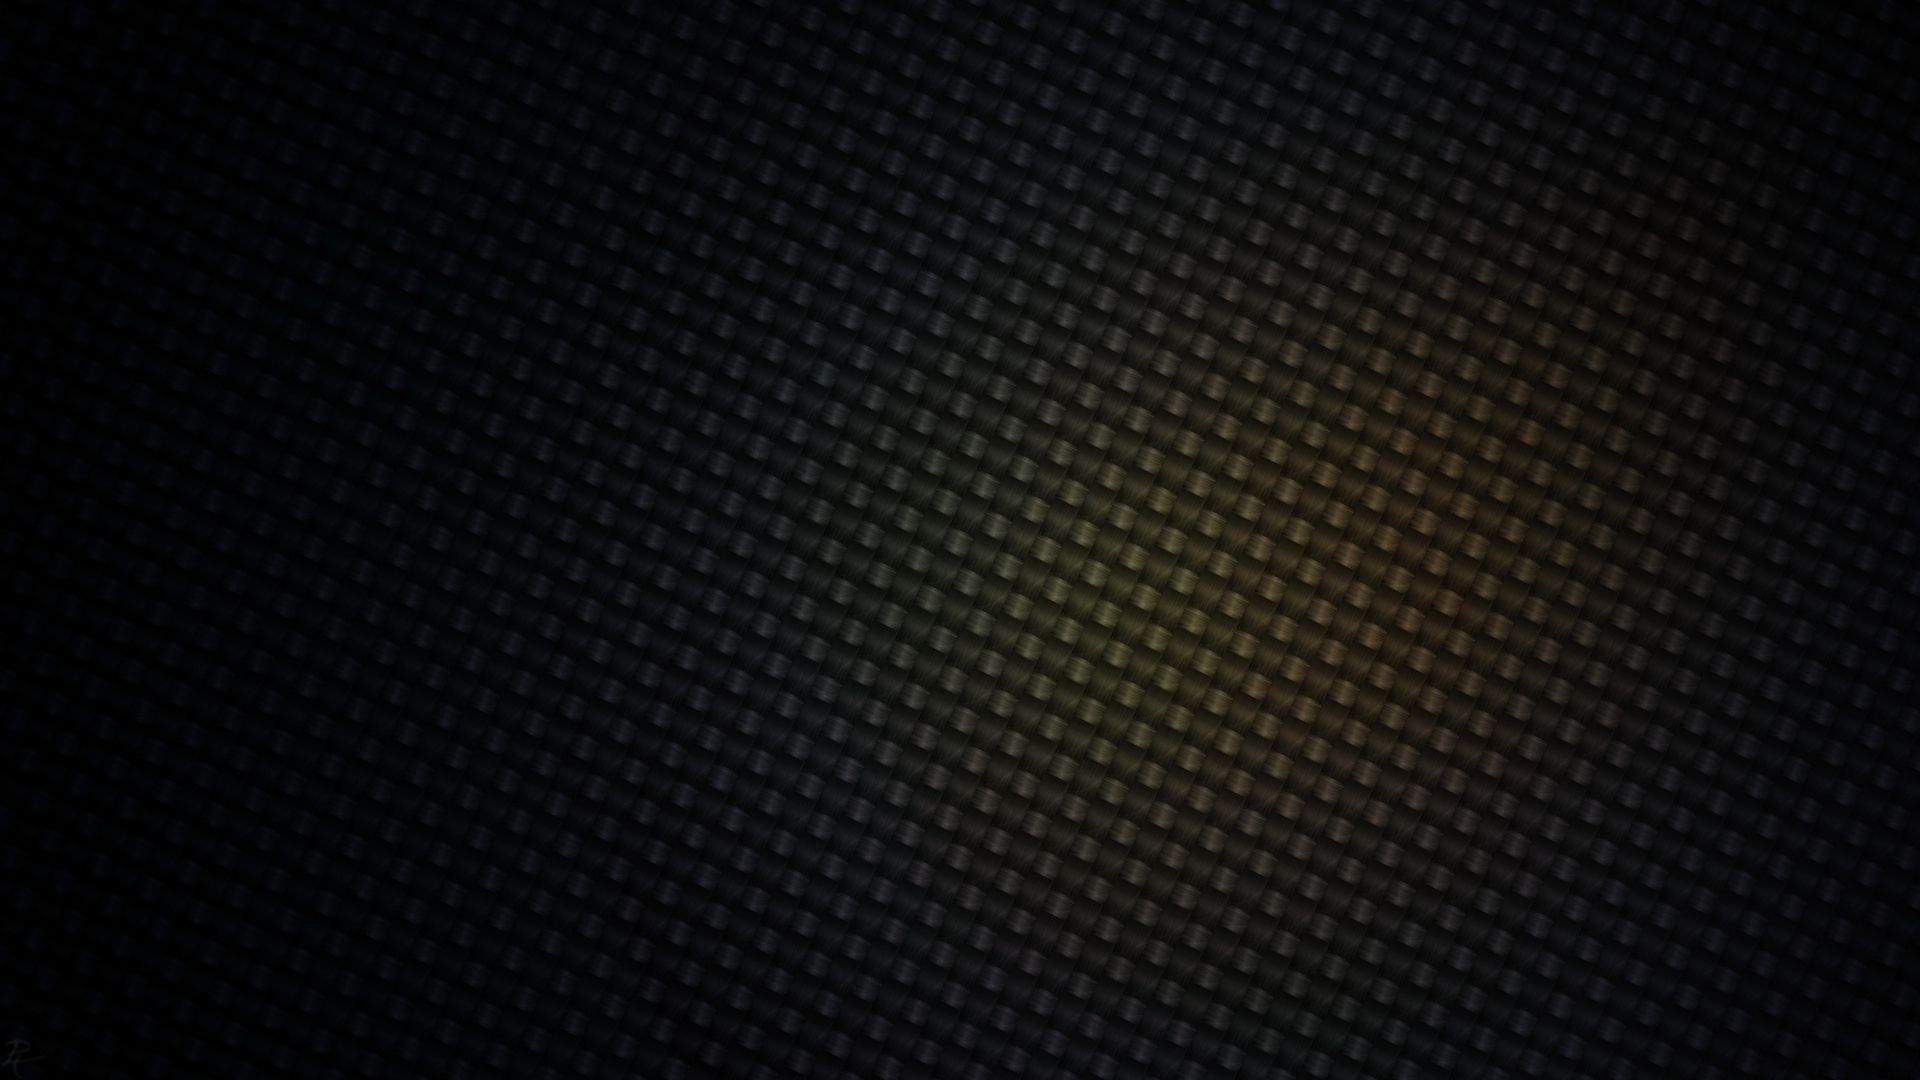 4K Carbon Fiber Wallpapers - Top Free 4K Carbon Fiber ...